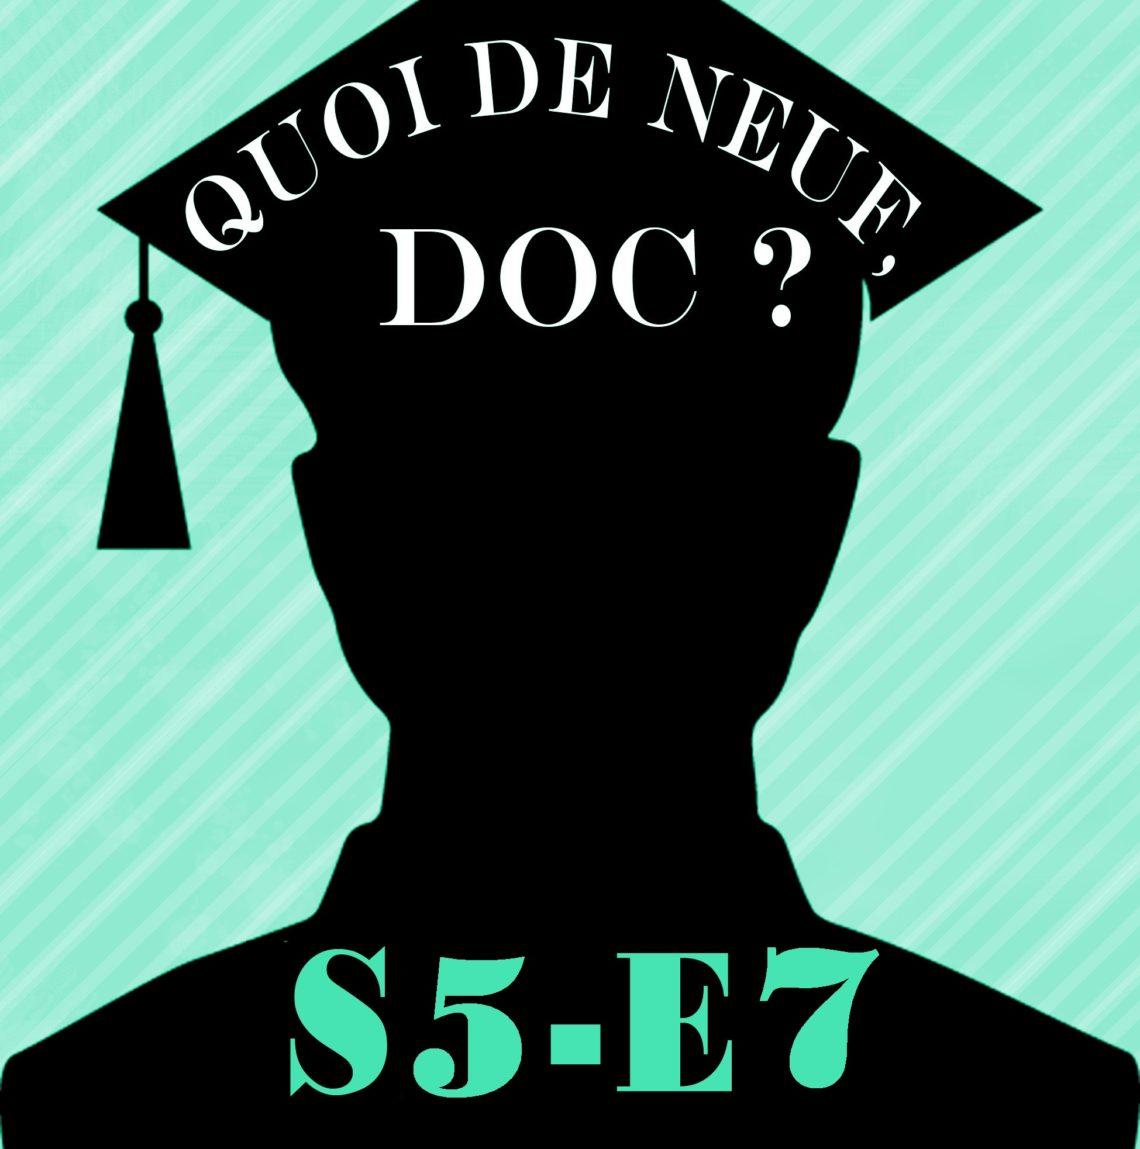 QDND S5E7 du mercredi 10 avril 2019